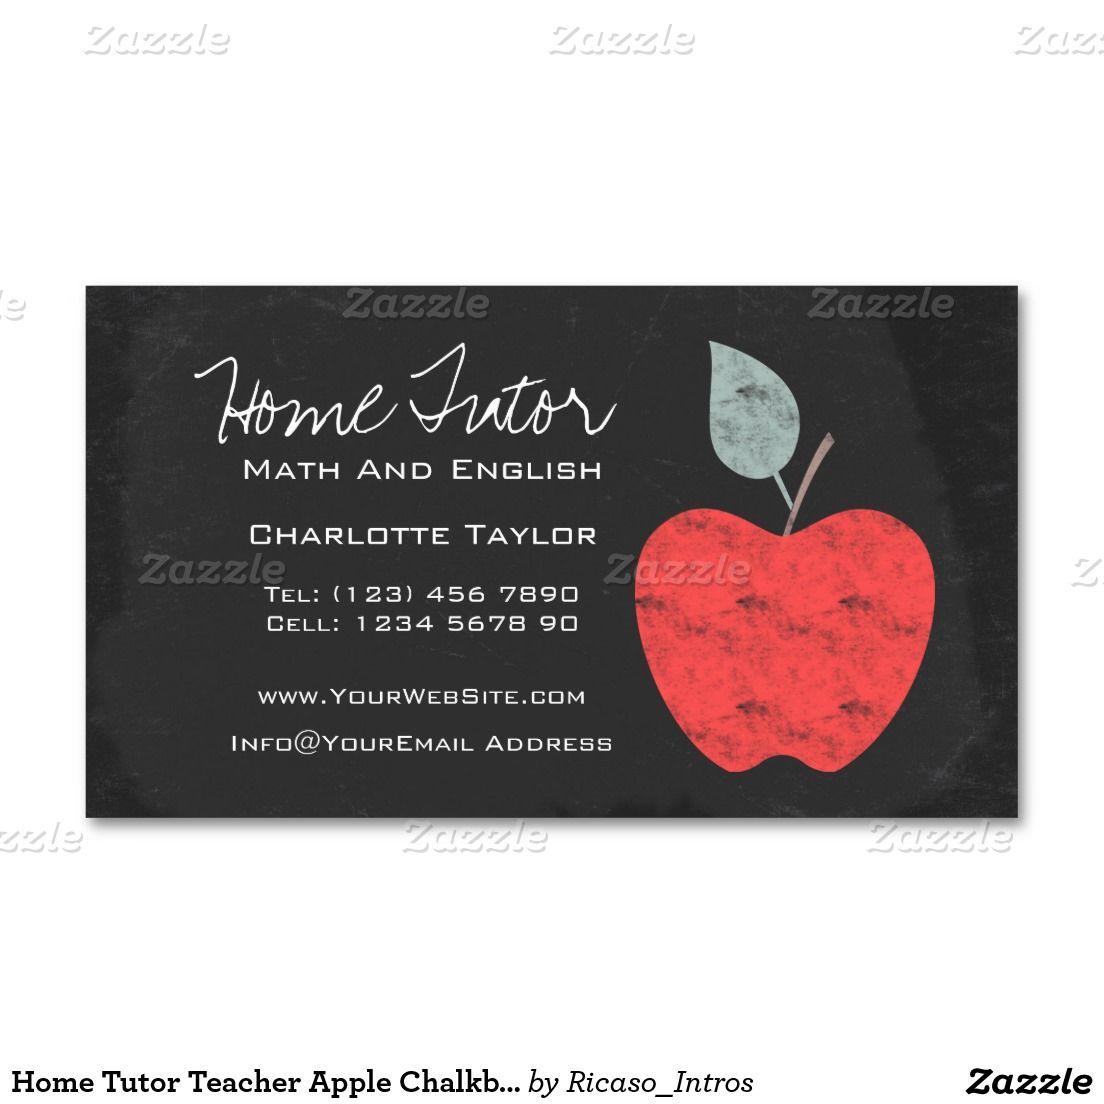 Home Tutor Teacher Apple Chalkboard Business Card Zazzle Com In 2021 Substitute Teacher Business Cards Teacher Business Cards Home Tutors